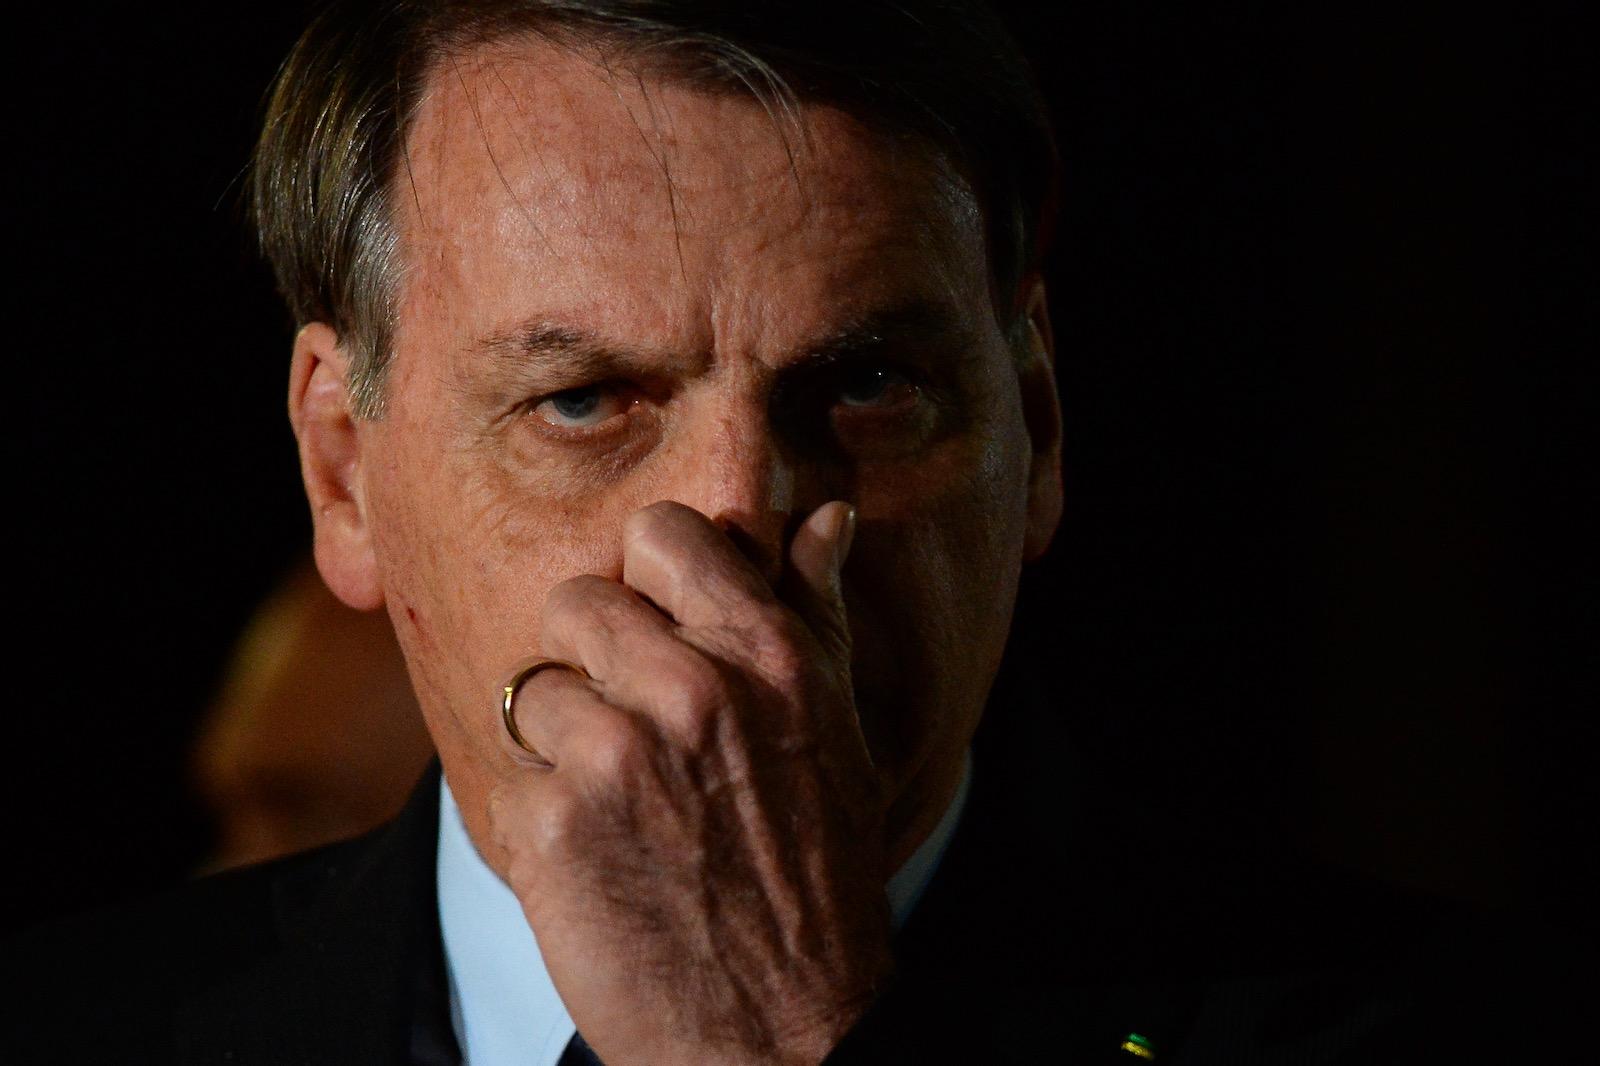 President Jair Bolsonaro during a press conference at Alvorada Palace, Brasilia, Brazil, June 5, 2020